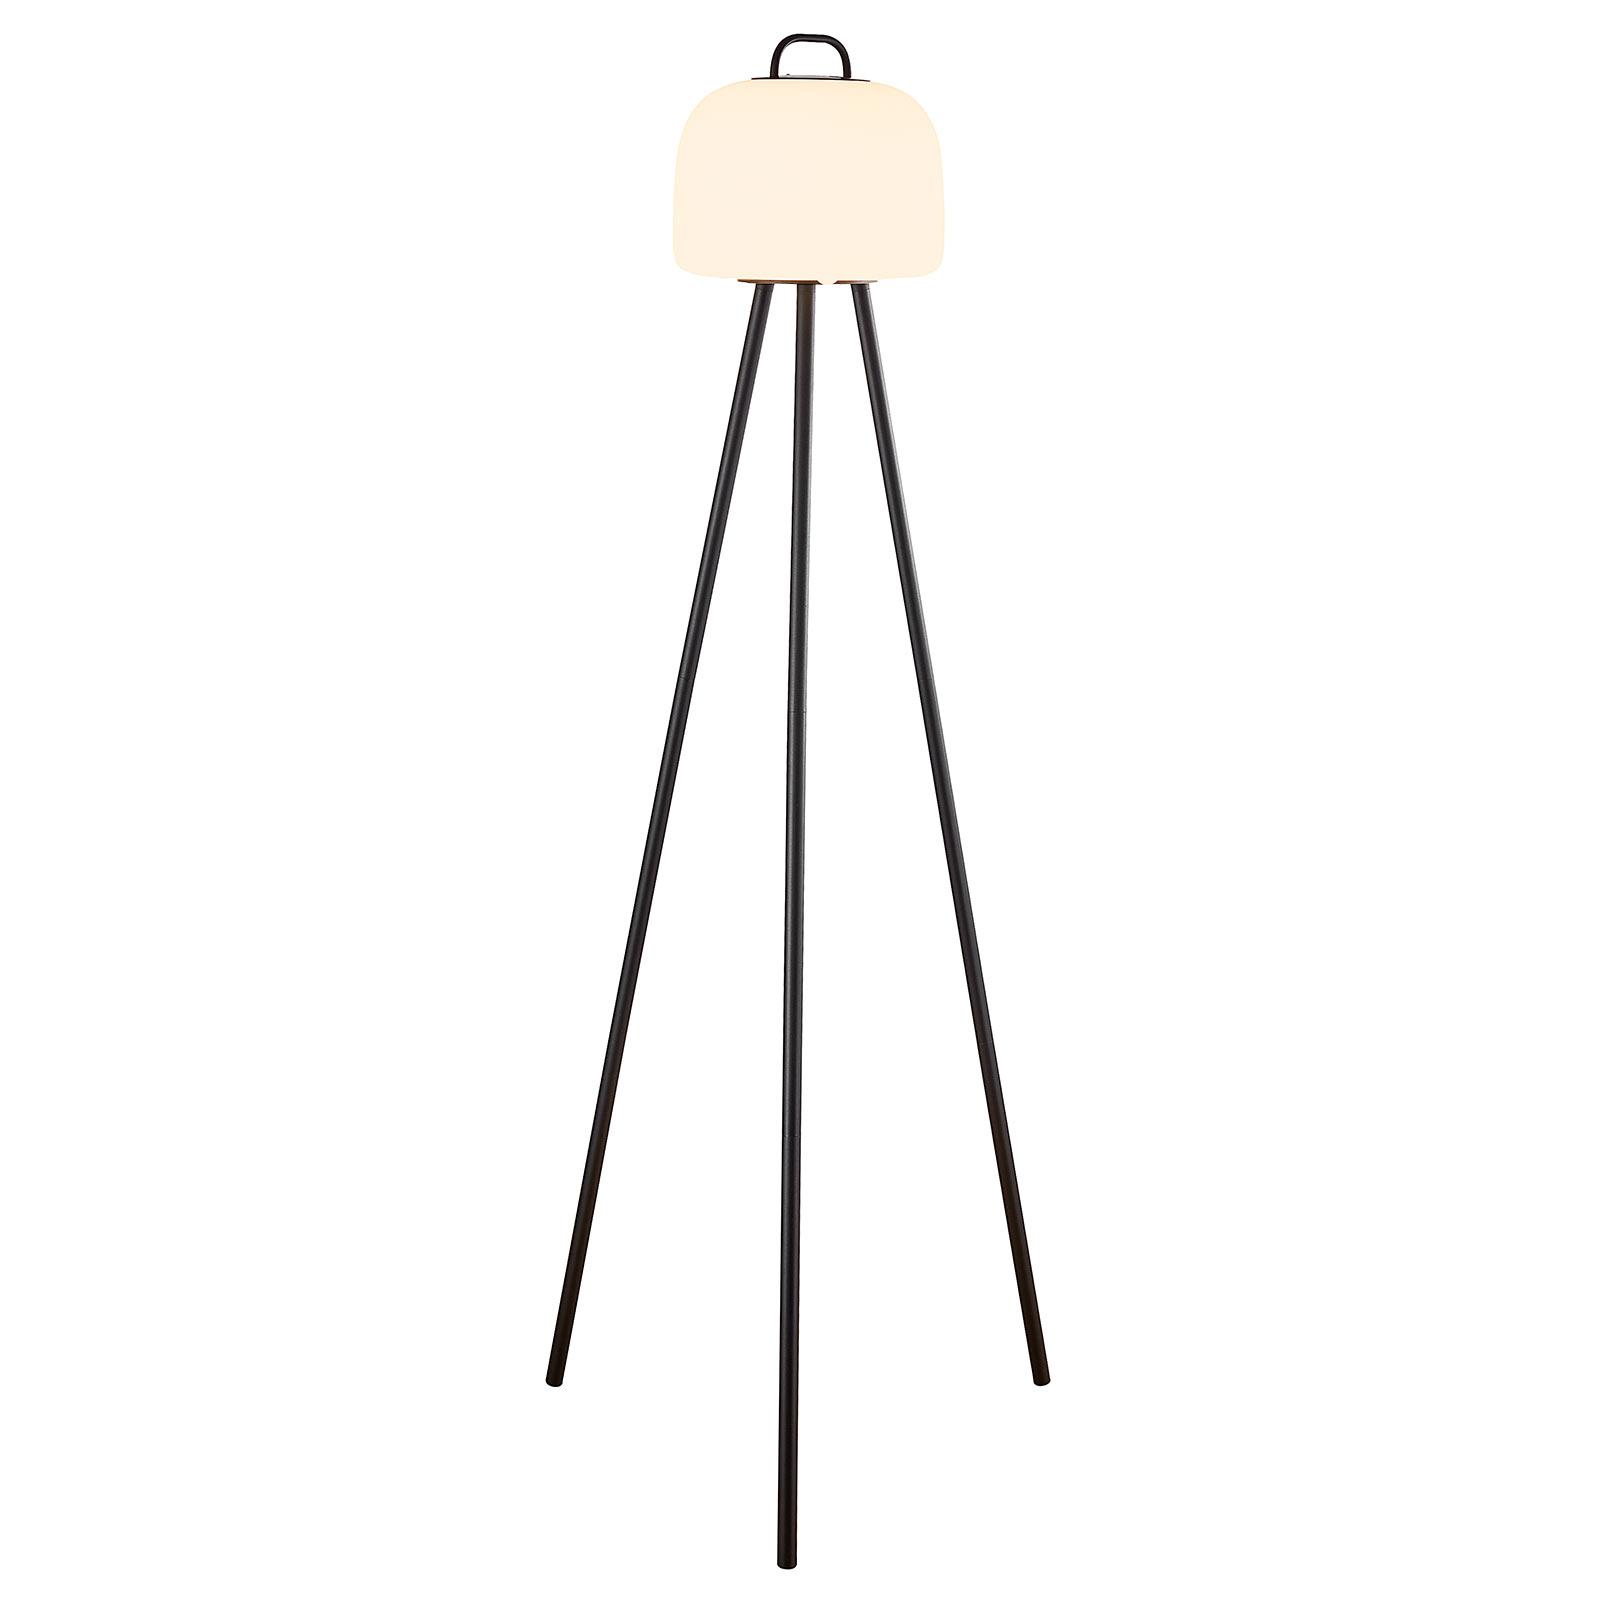 Lampada LED terra Kettle treppiede metallo, 22cm